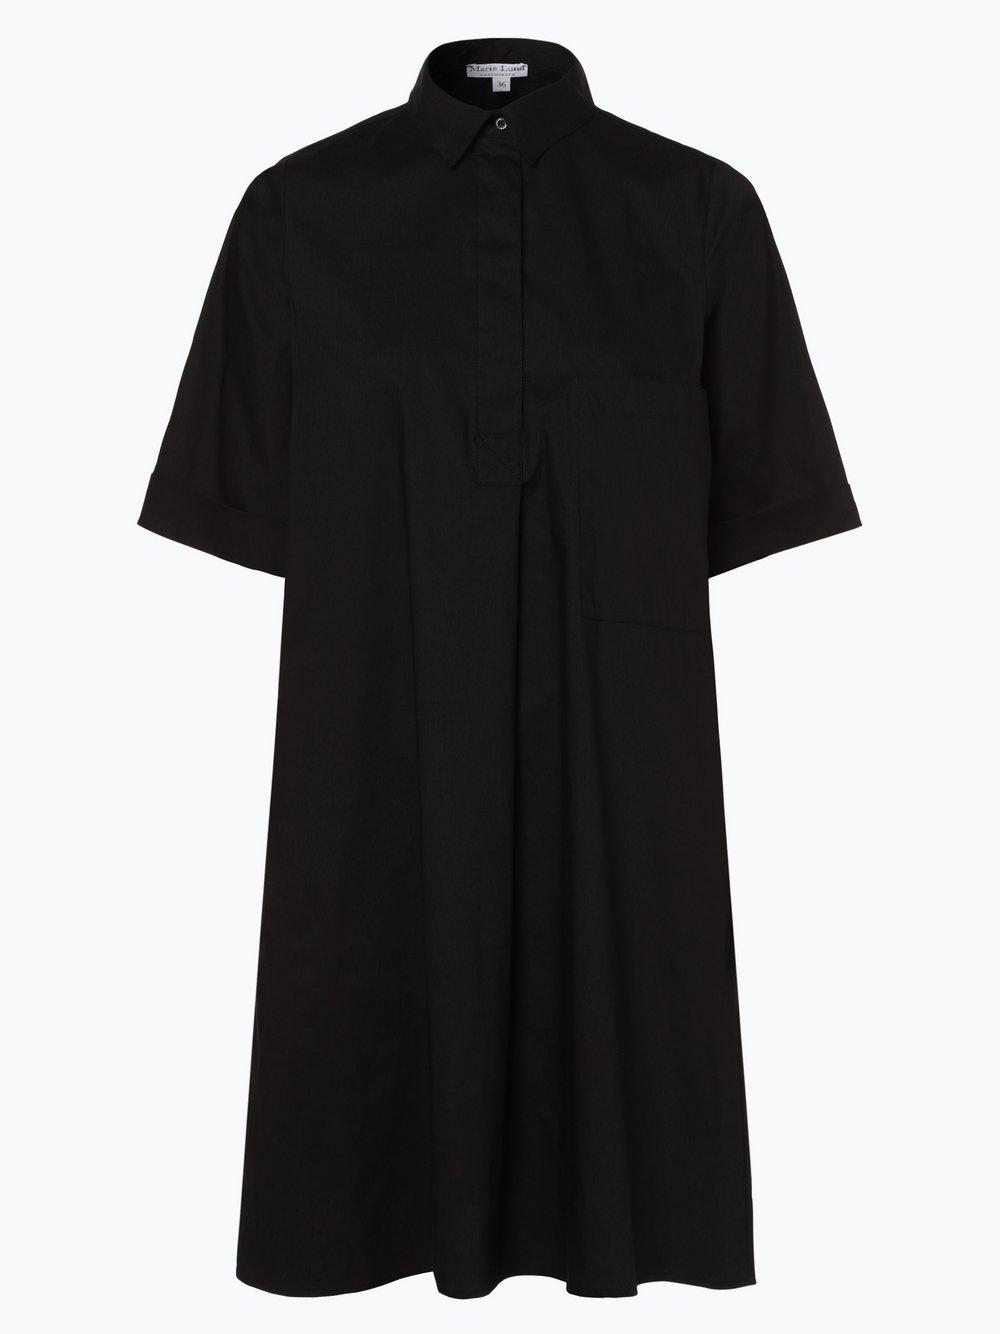 Marie Lund - Sukienka damska, czarny